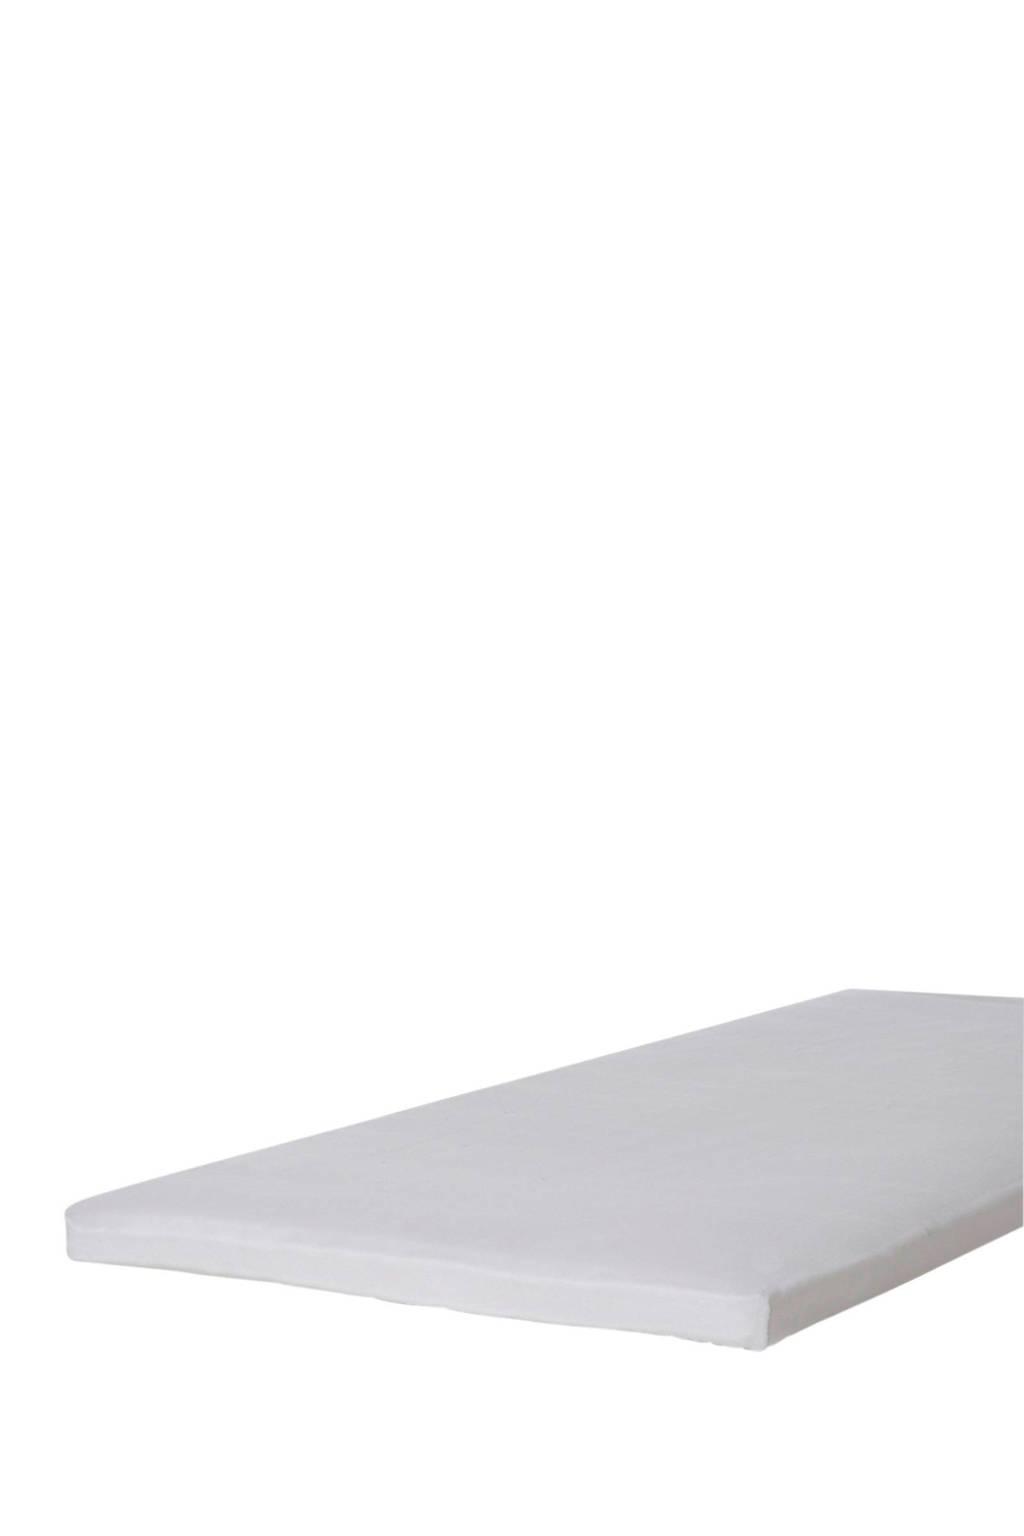 Beddinghouse molton topmatras hoeslaken tot 10 cm matras, Wit